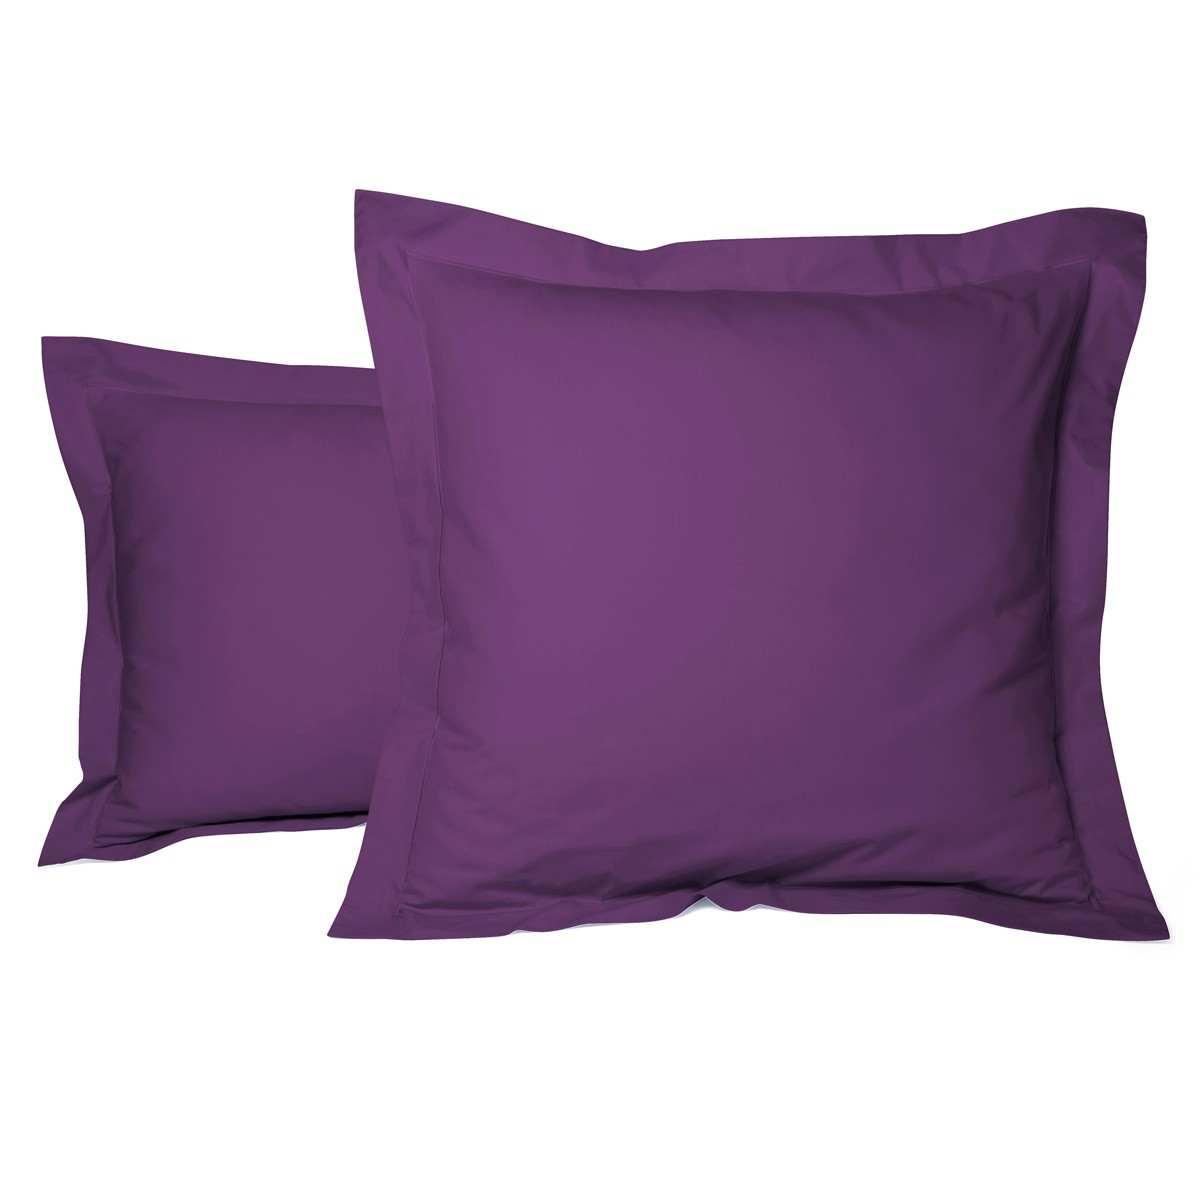 taie oreiller unie percale soldes jusqu 39 55 linge. Black Bedroom Furniture Sets. Home Design Ideas